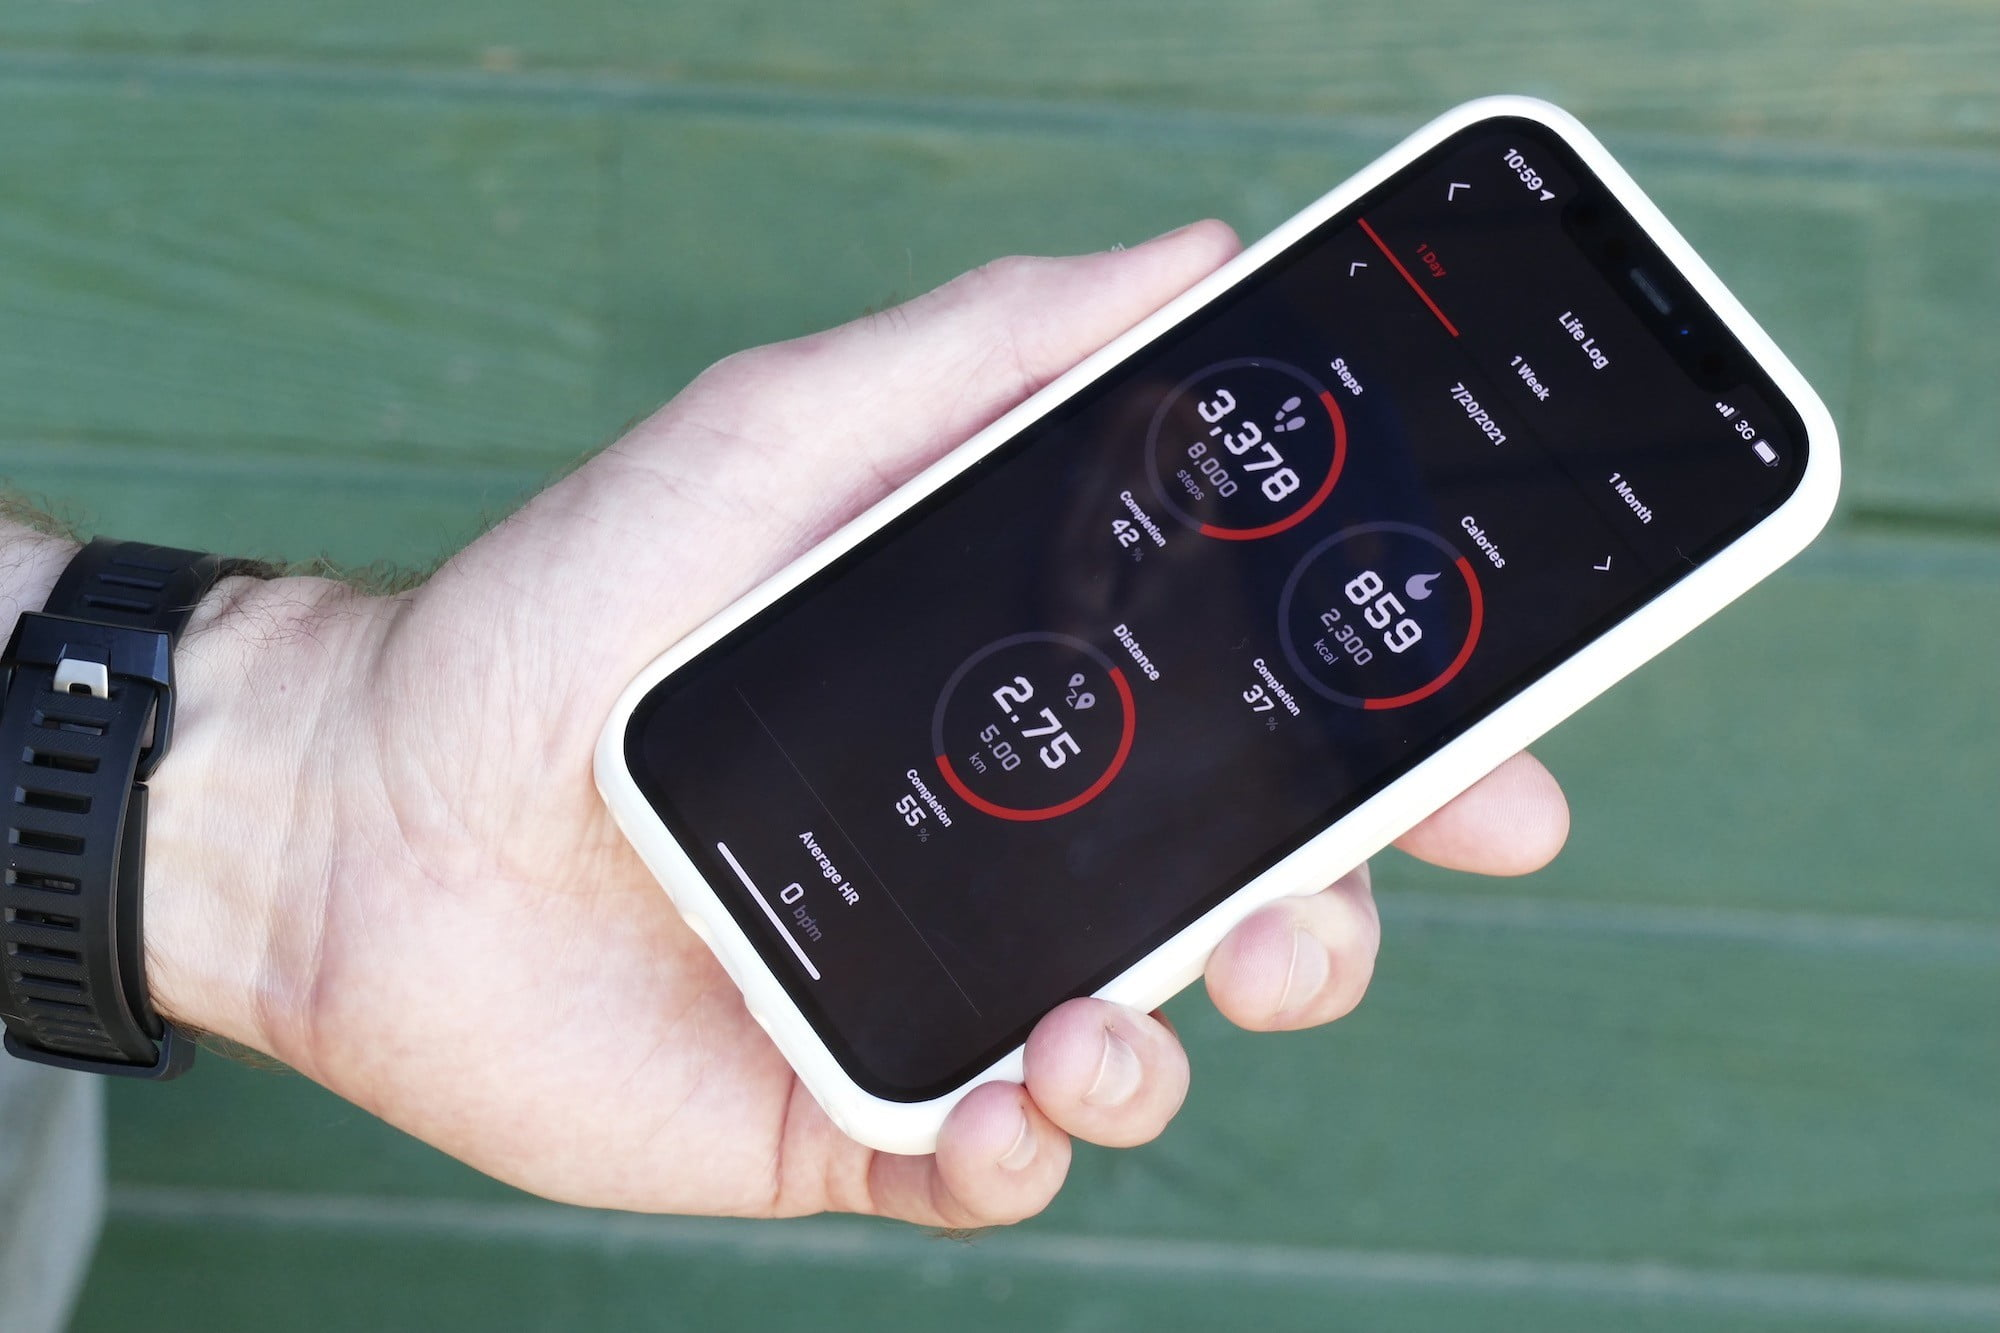 casio g shock gbd 200 review move app log